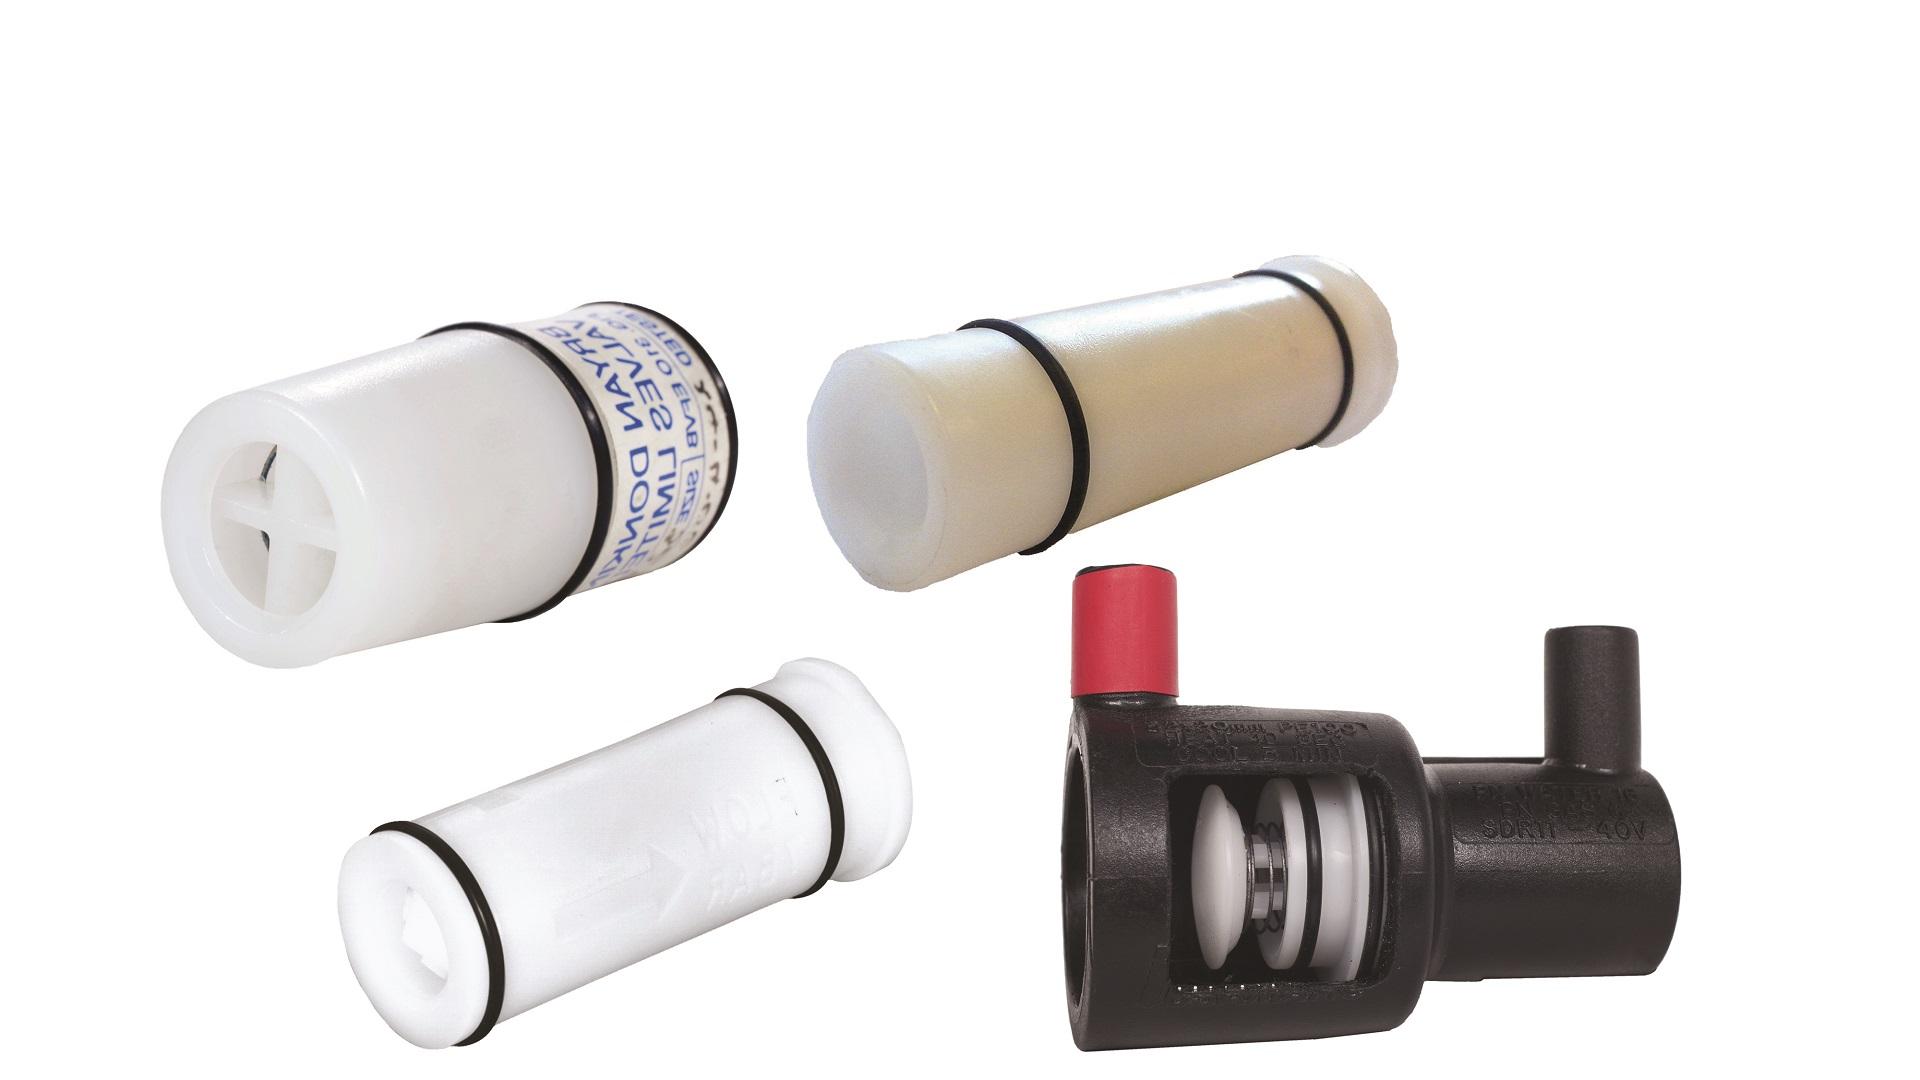 AVK Pressure and control valves